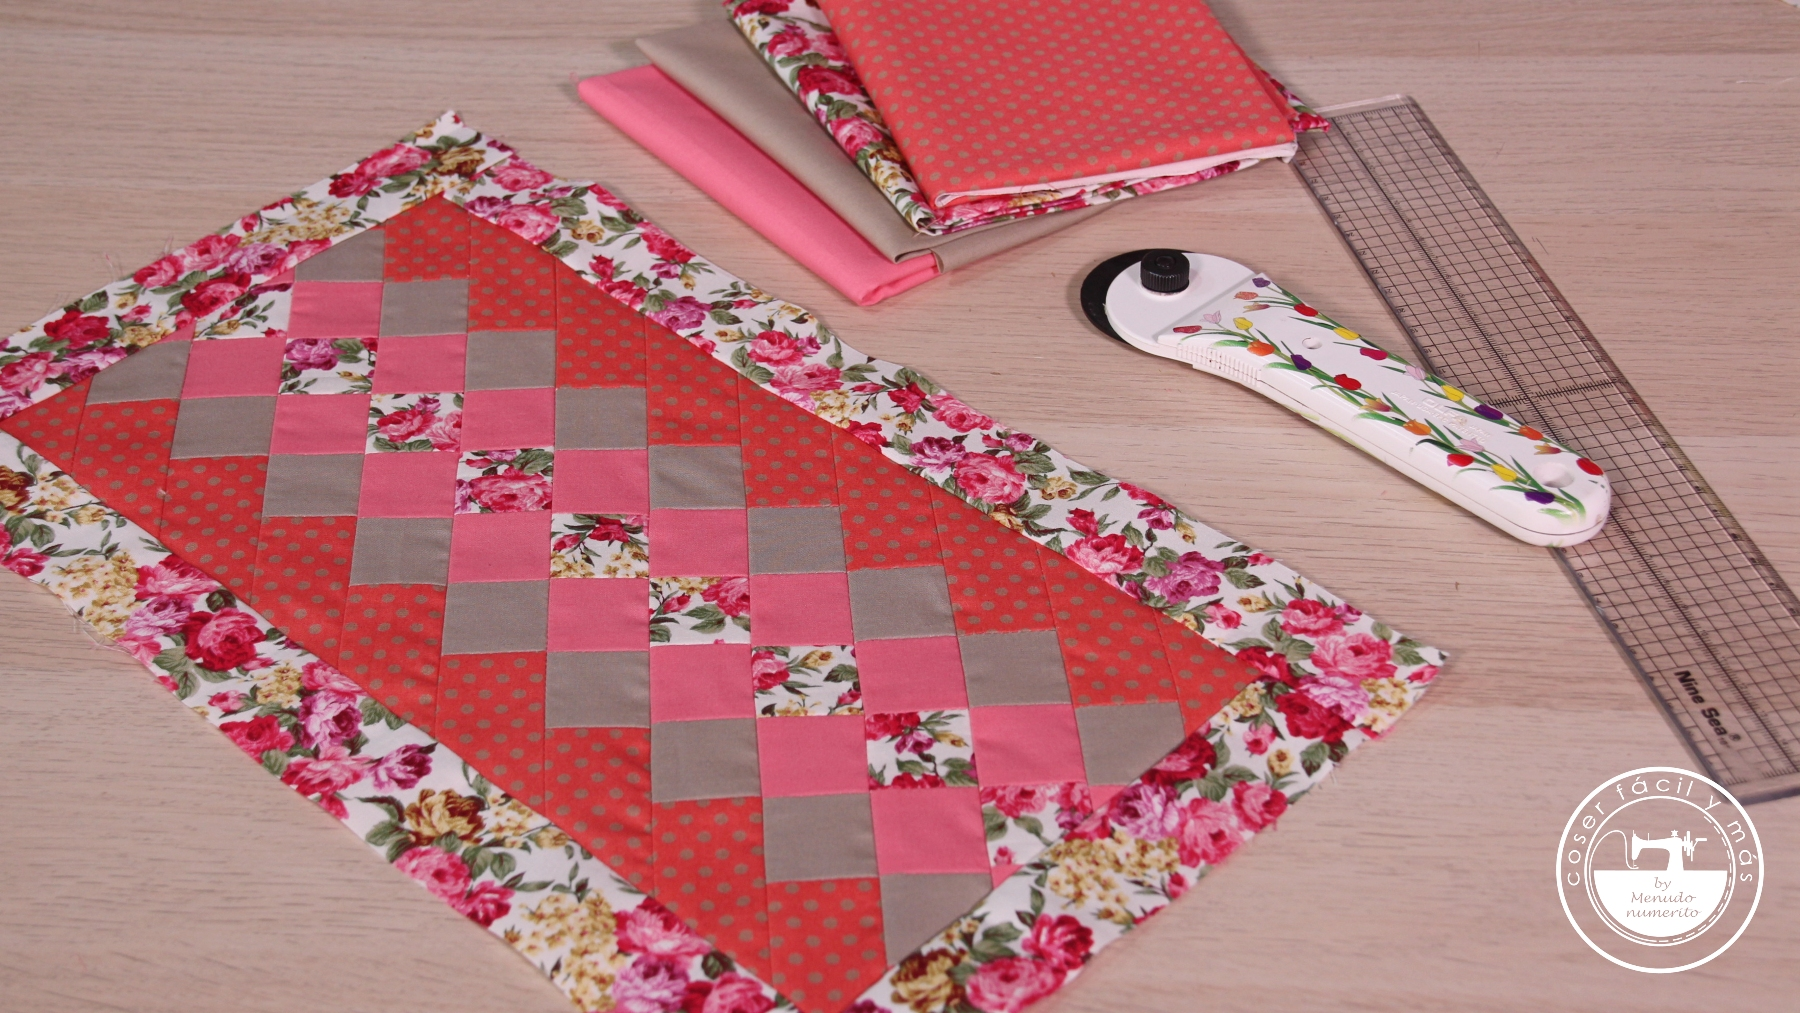 seminole patchwork blog menudo numerito